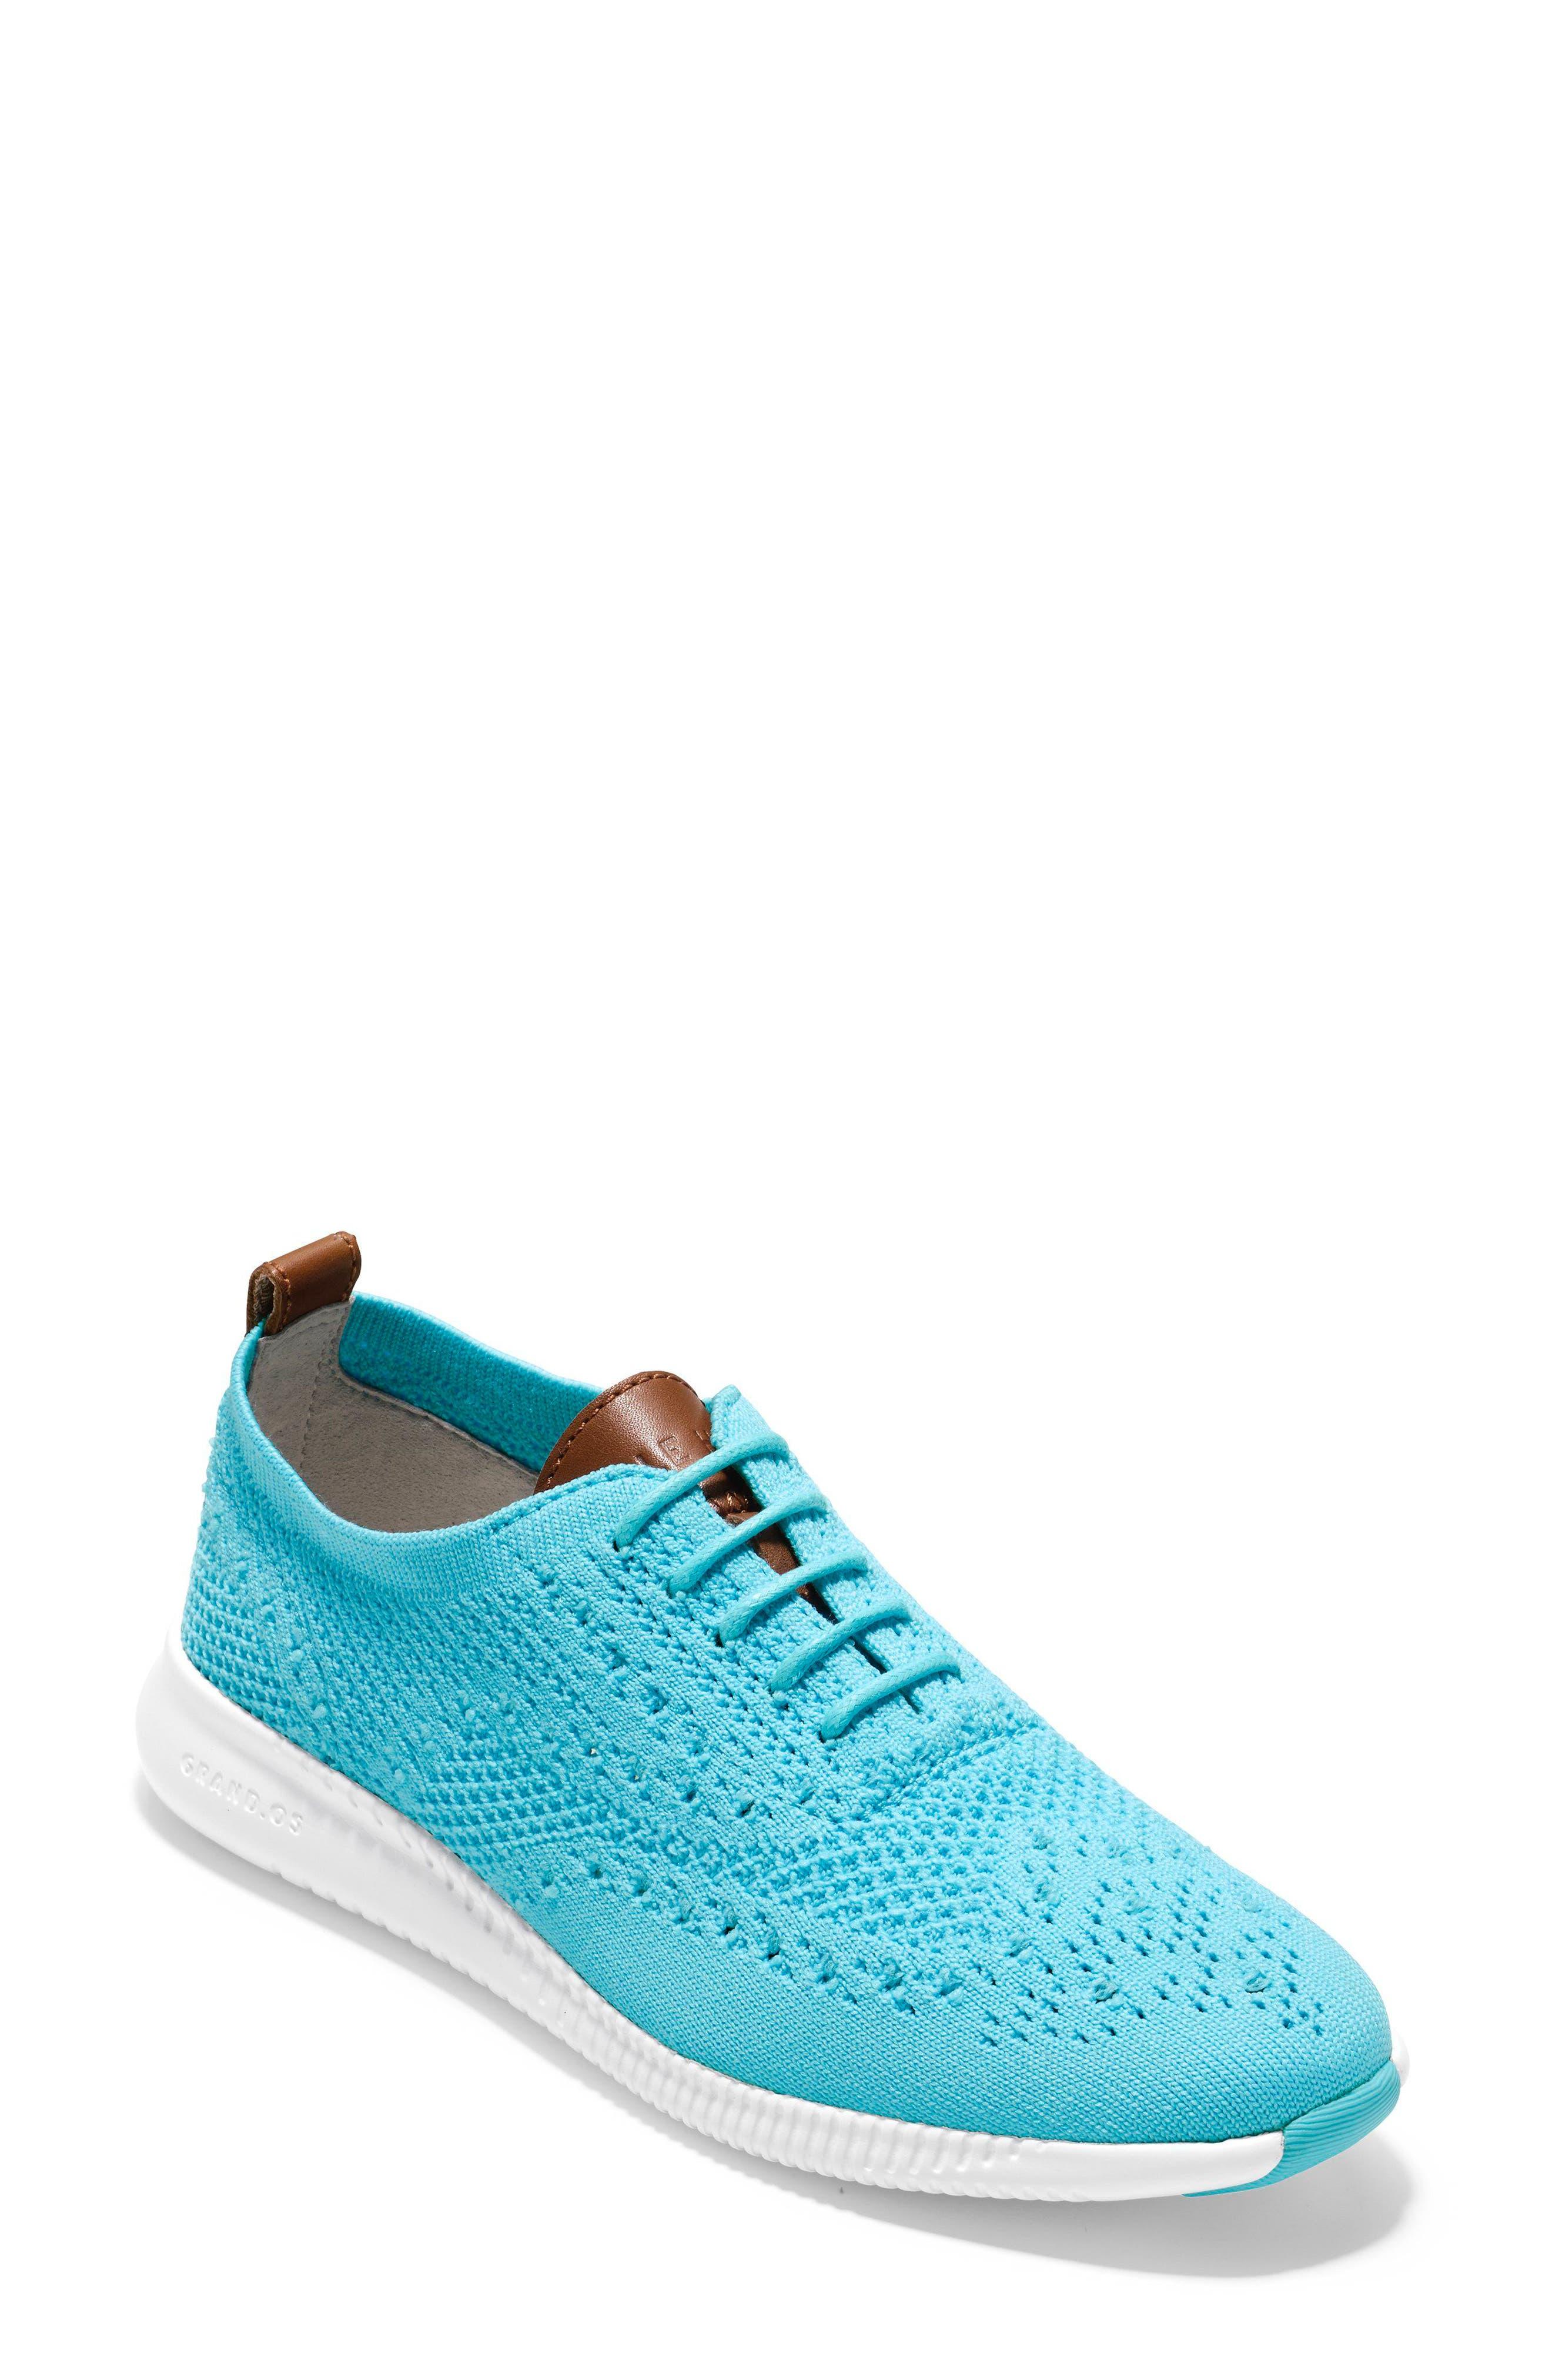 2.ZERØGRAND Stitchlite Wingtip Sneaker,                             Main thumbnail 1, color,                             Bluefish Fabric